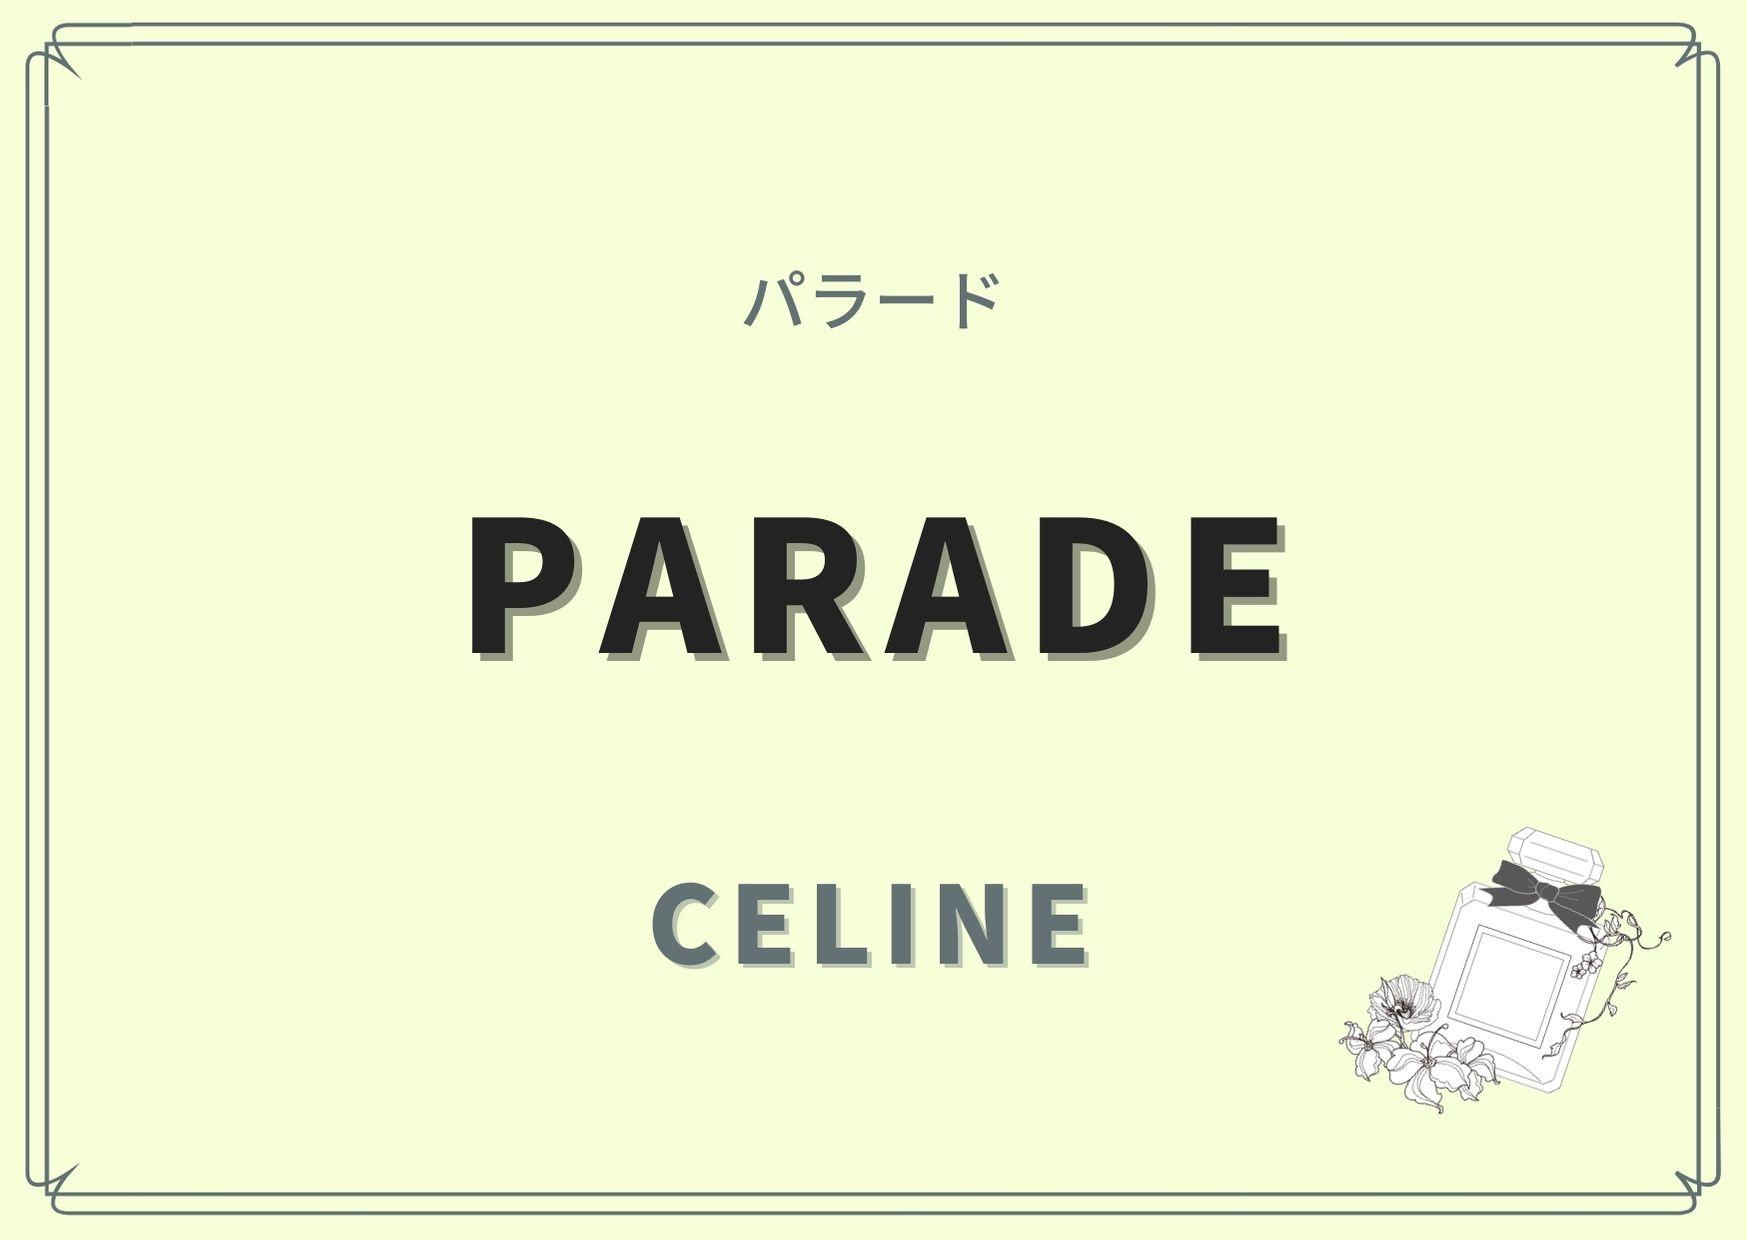 Parade(パラード)/CELINE(セリーヌ)